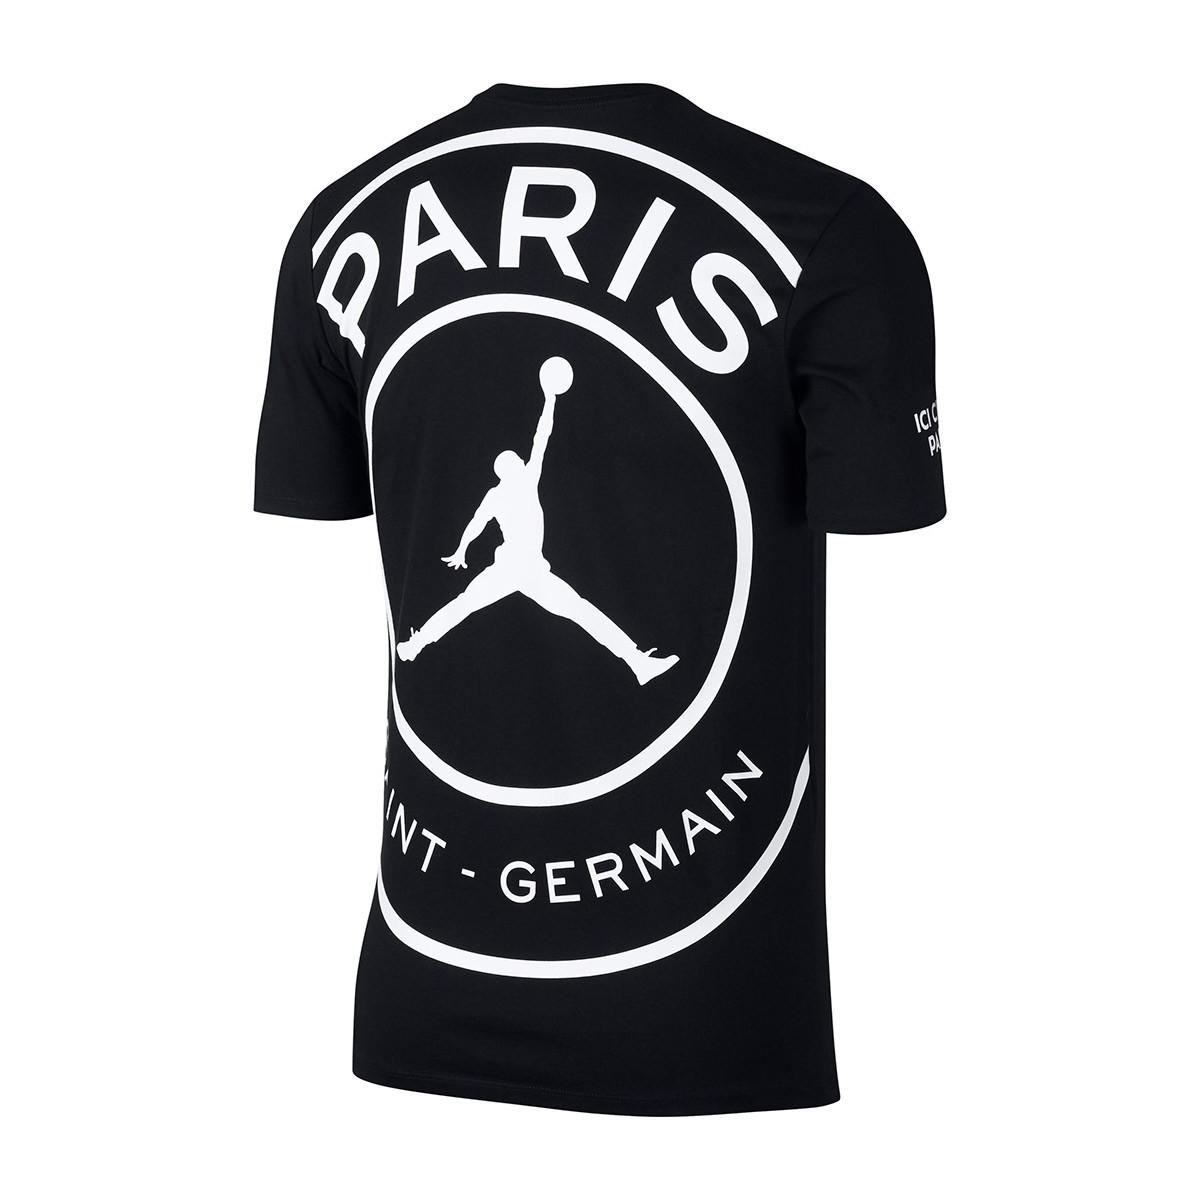 670ada05d Camiseta Nike Jordan x PSG SS Black-White - Tienda de fútbol Fútbol Emotion